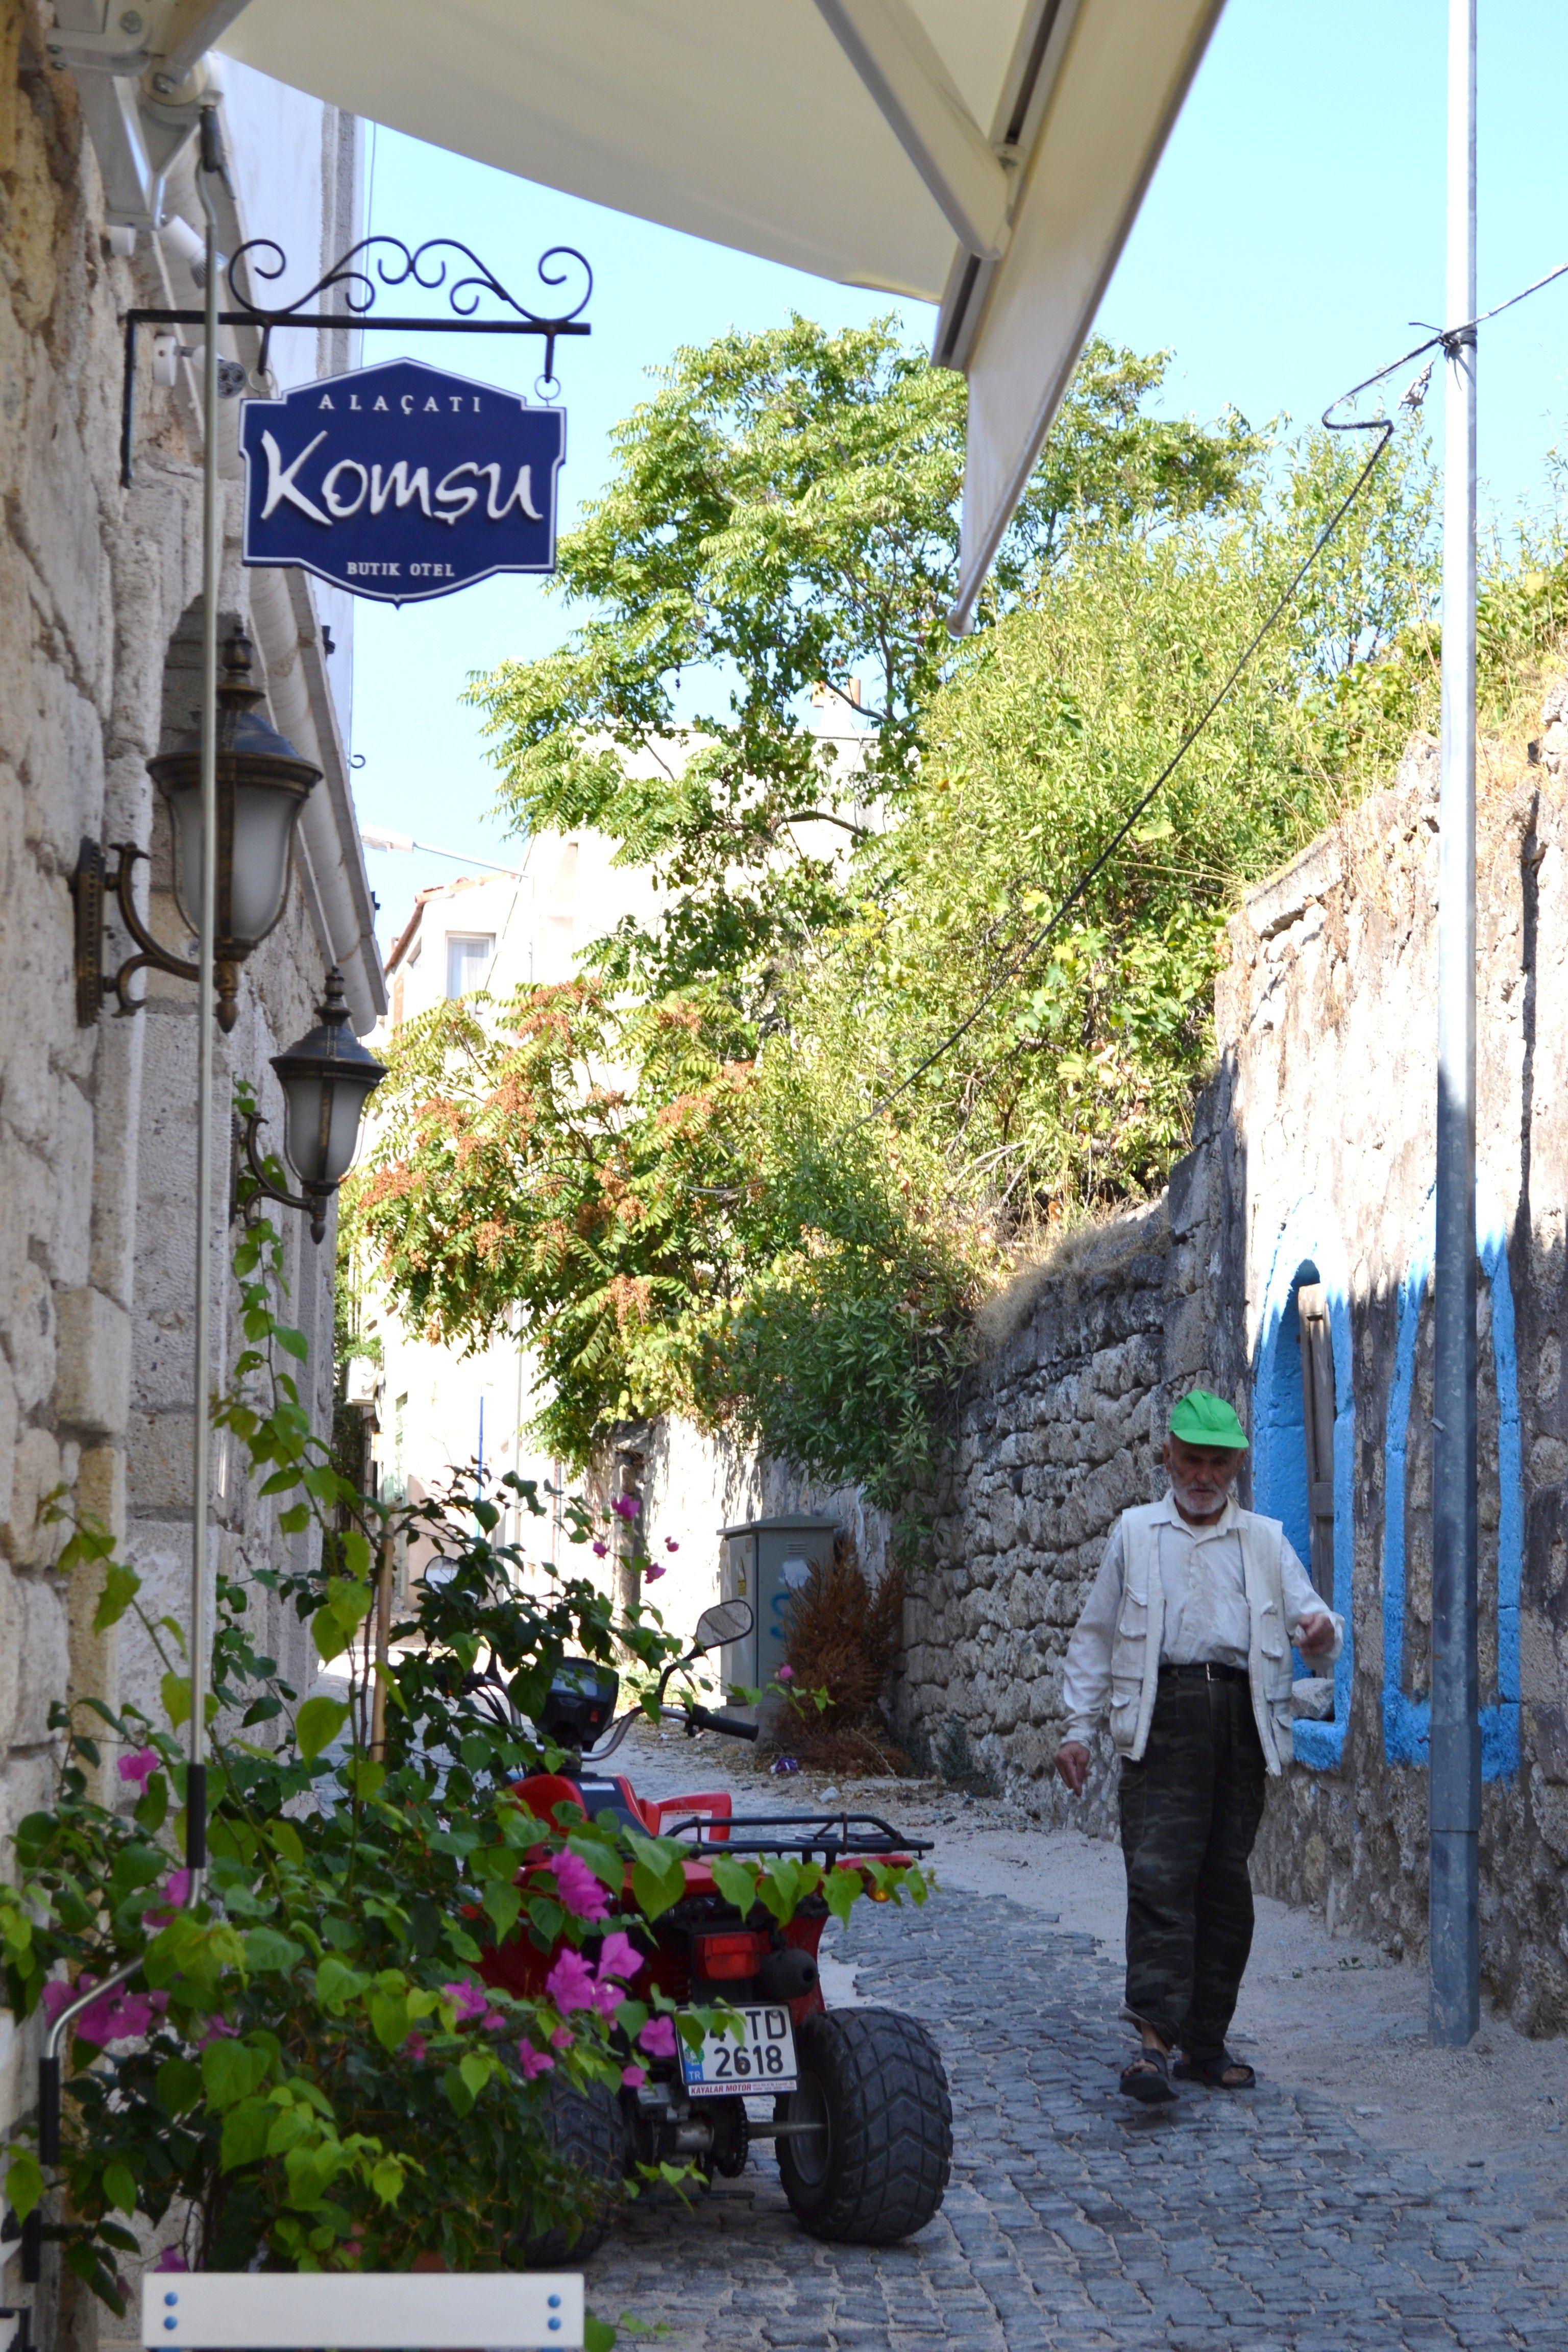 Little street in Alacati, Izmir